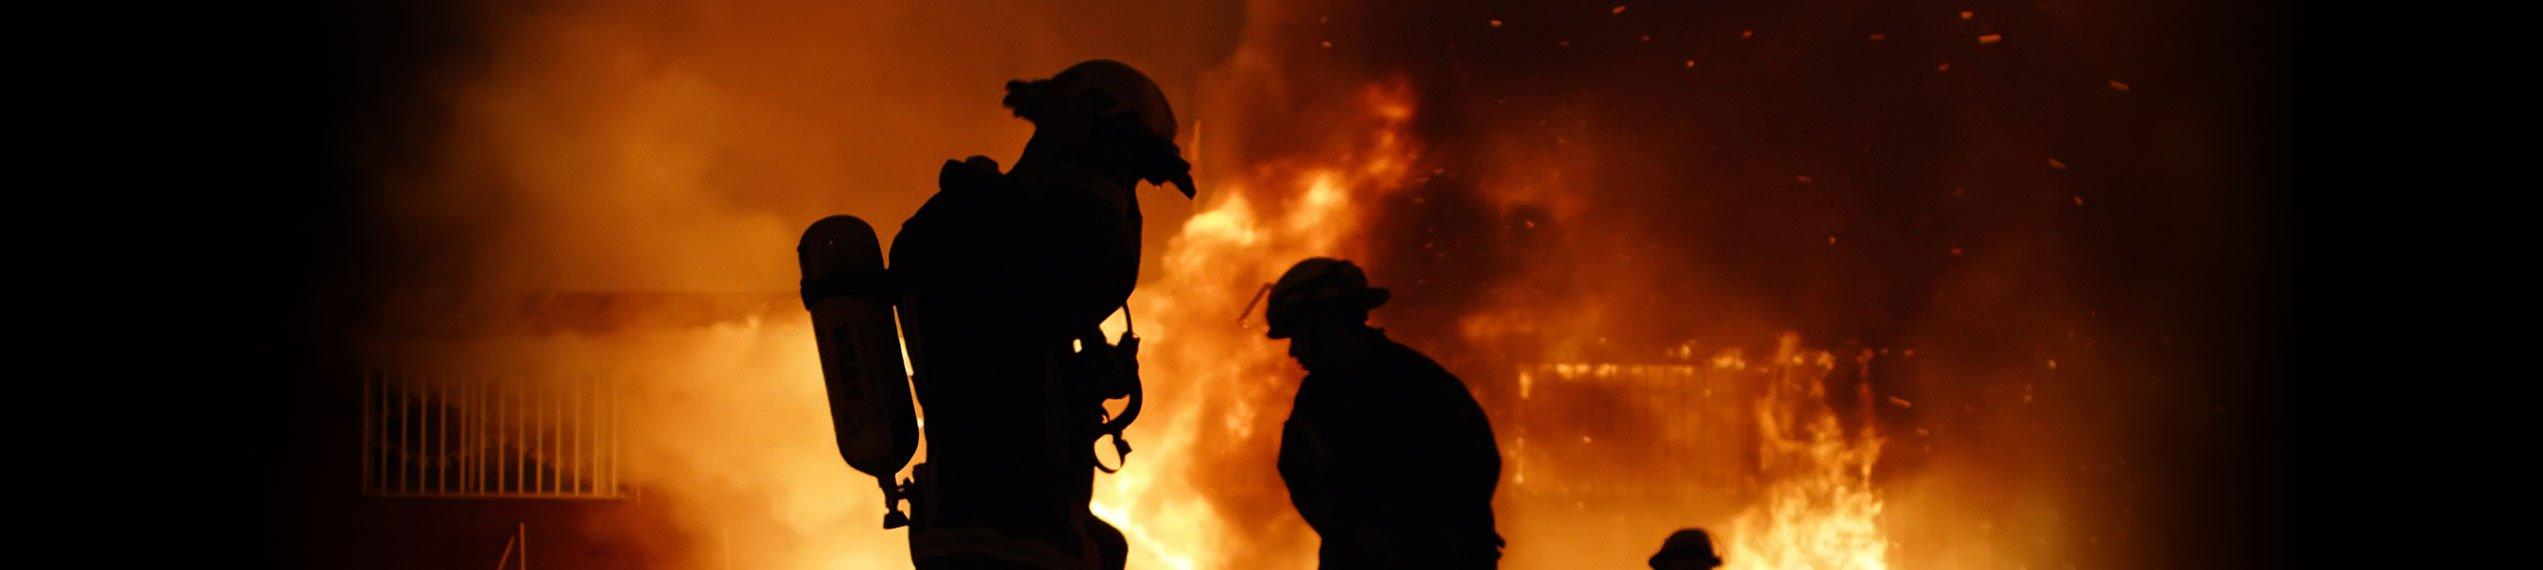 Fire & Smoke Damage Removal in Paul Davis Restoration of Western Pennsylvania